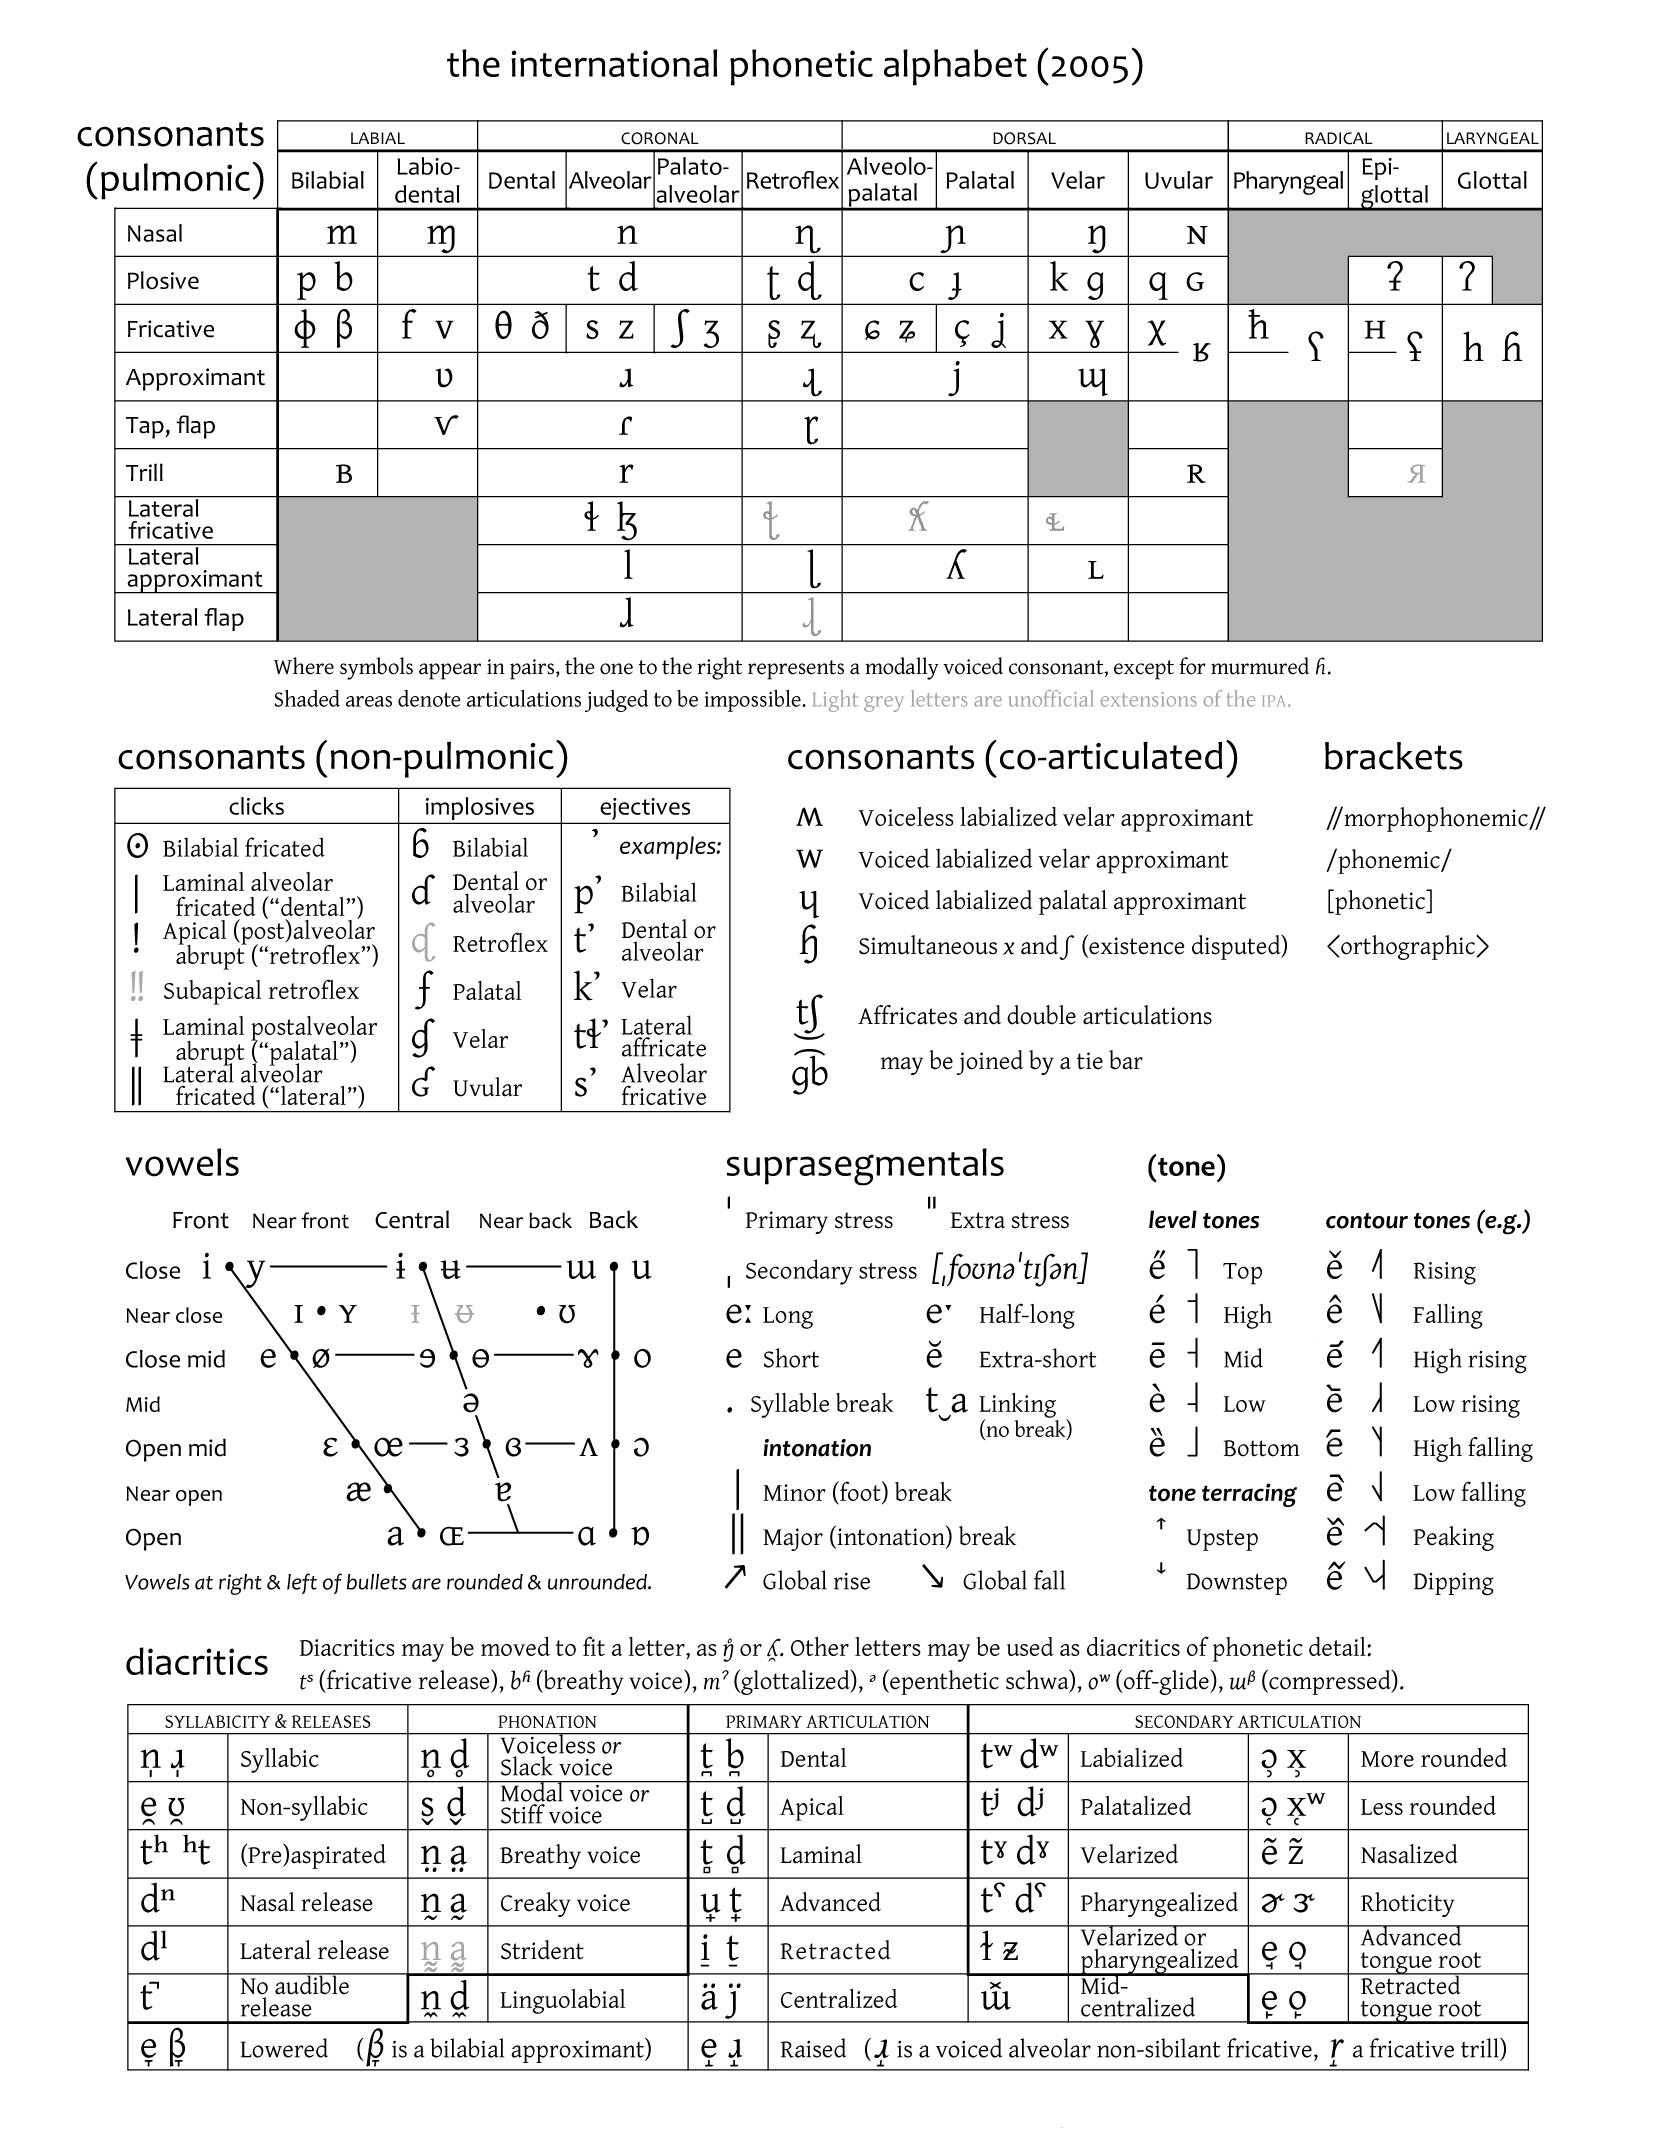 Pin by ashers pinscape on linguaphile pinterest phonetic alphabet charts ipa assessment phonetic alphabet speech pathology speech therapy therapy ideas english language omega biocorpaavc Images